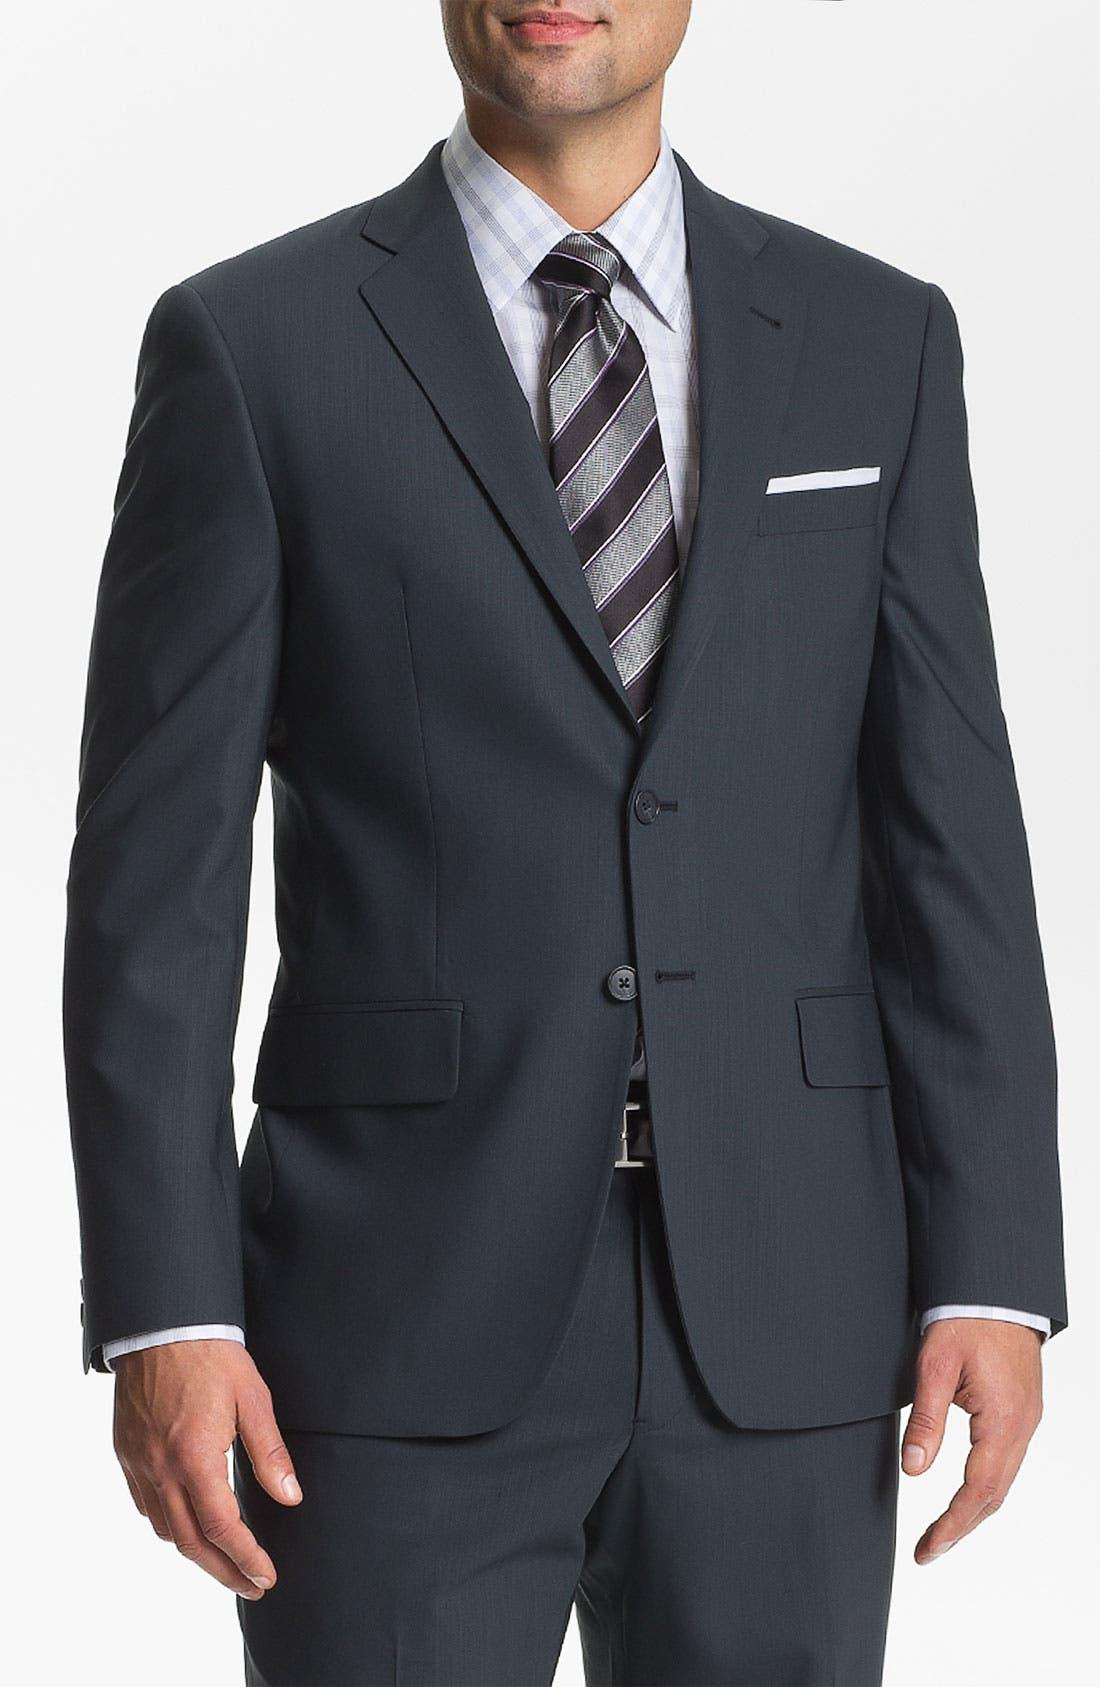 Alternate Image 1 Selected - Joseph Abboud 'Profile' Trim Fit Suit